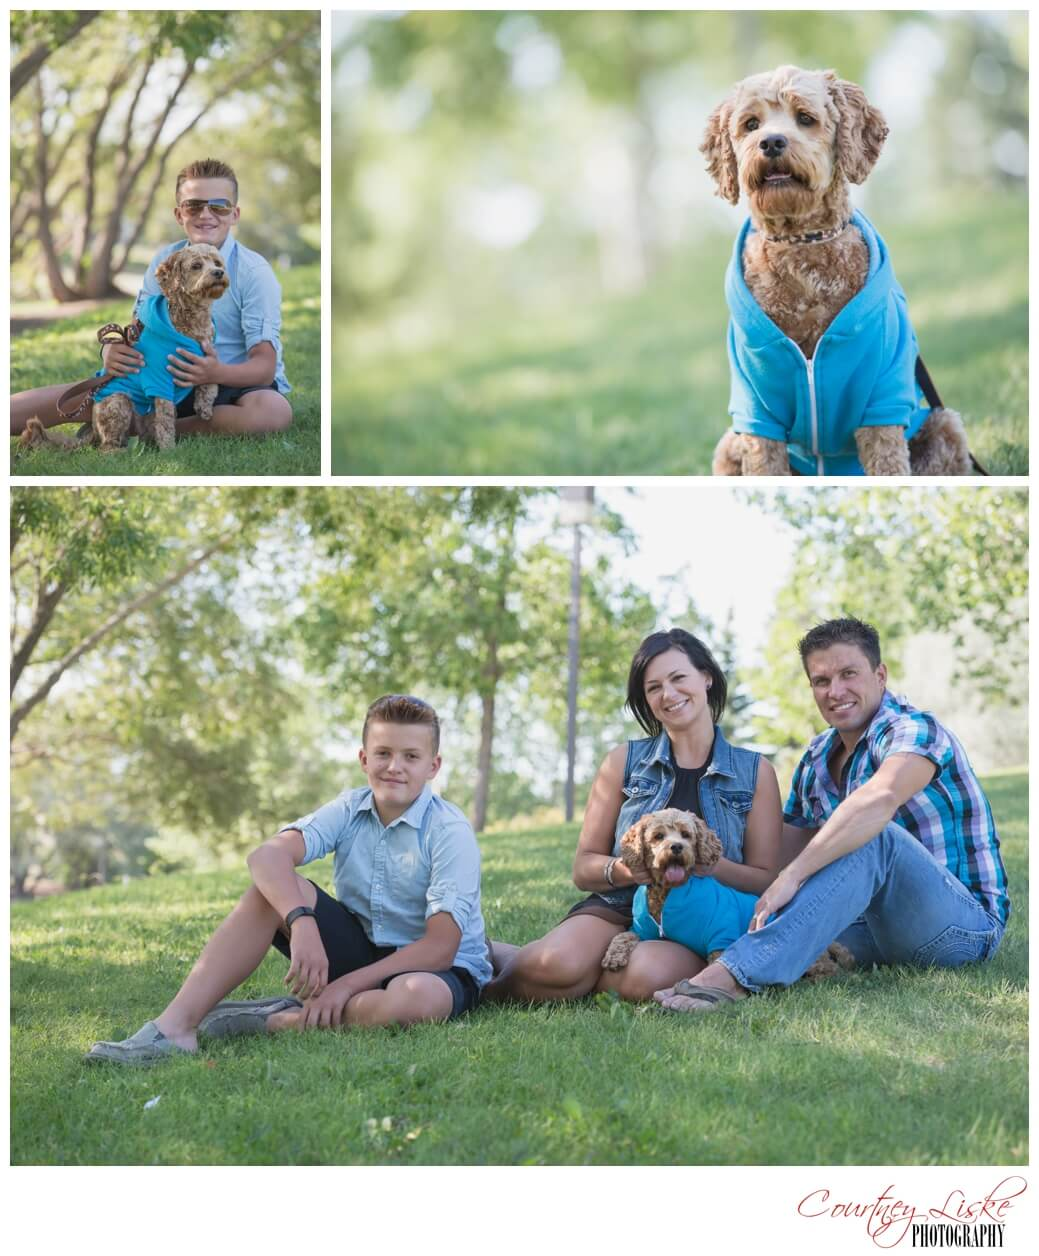 Tait Family - Regina Family Photographer - Courtney Liske Photography